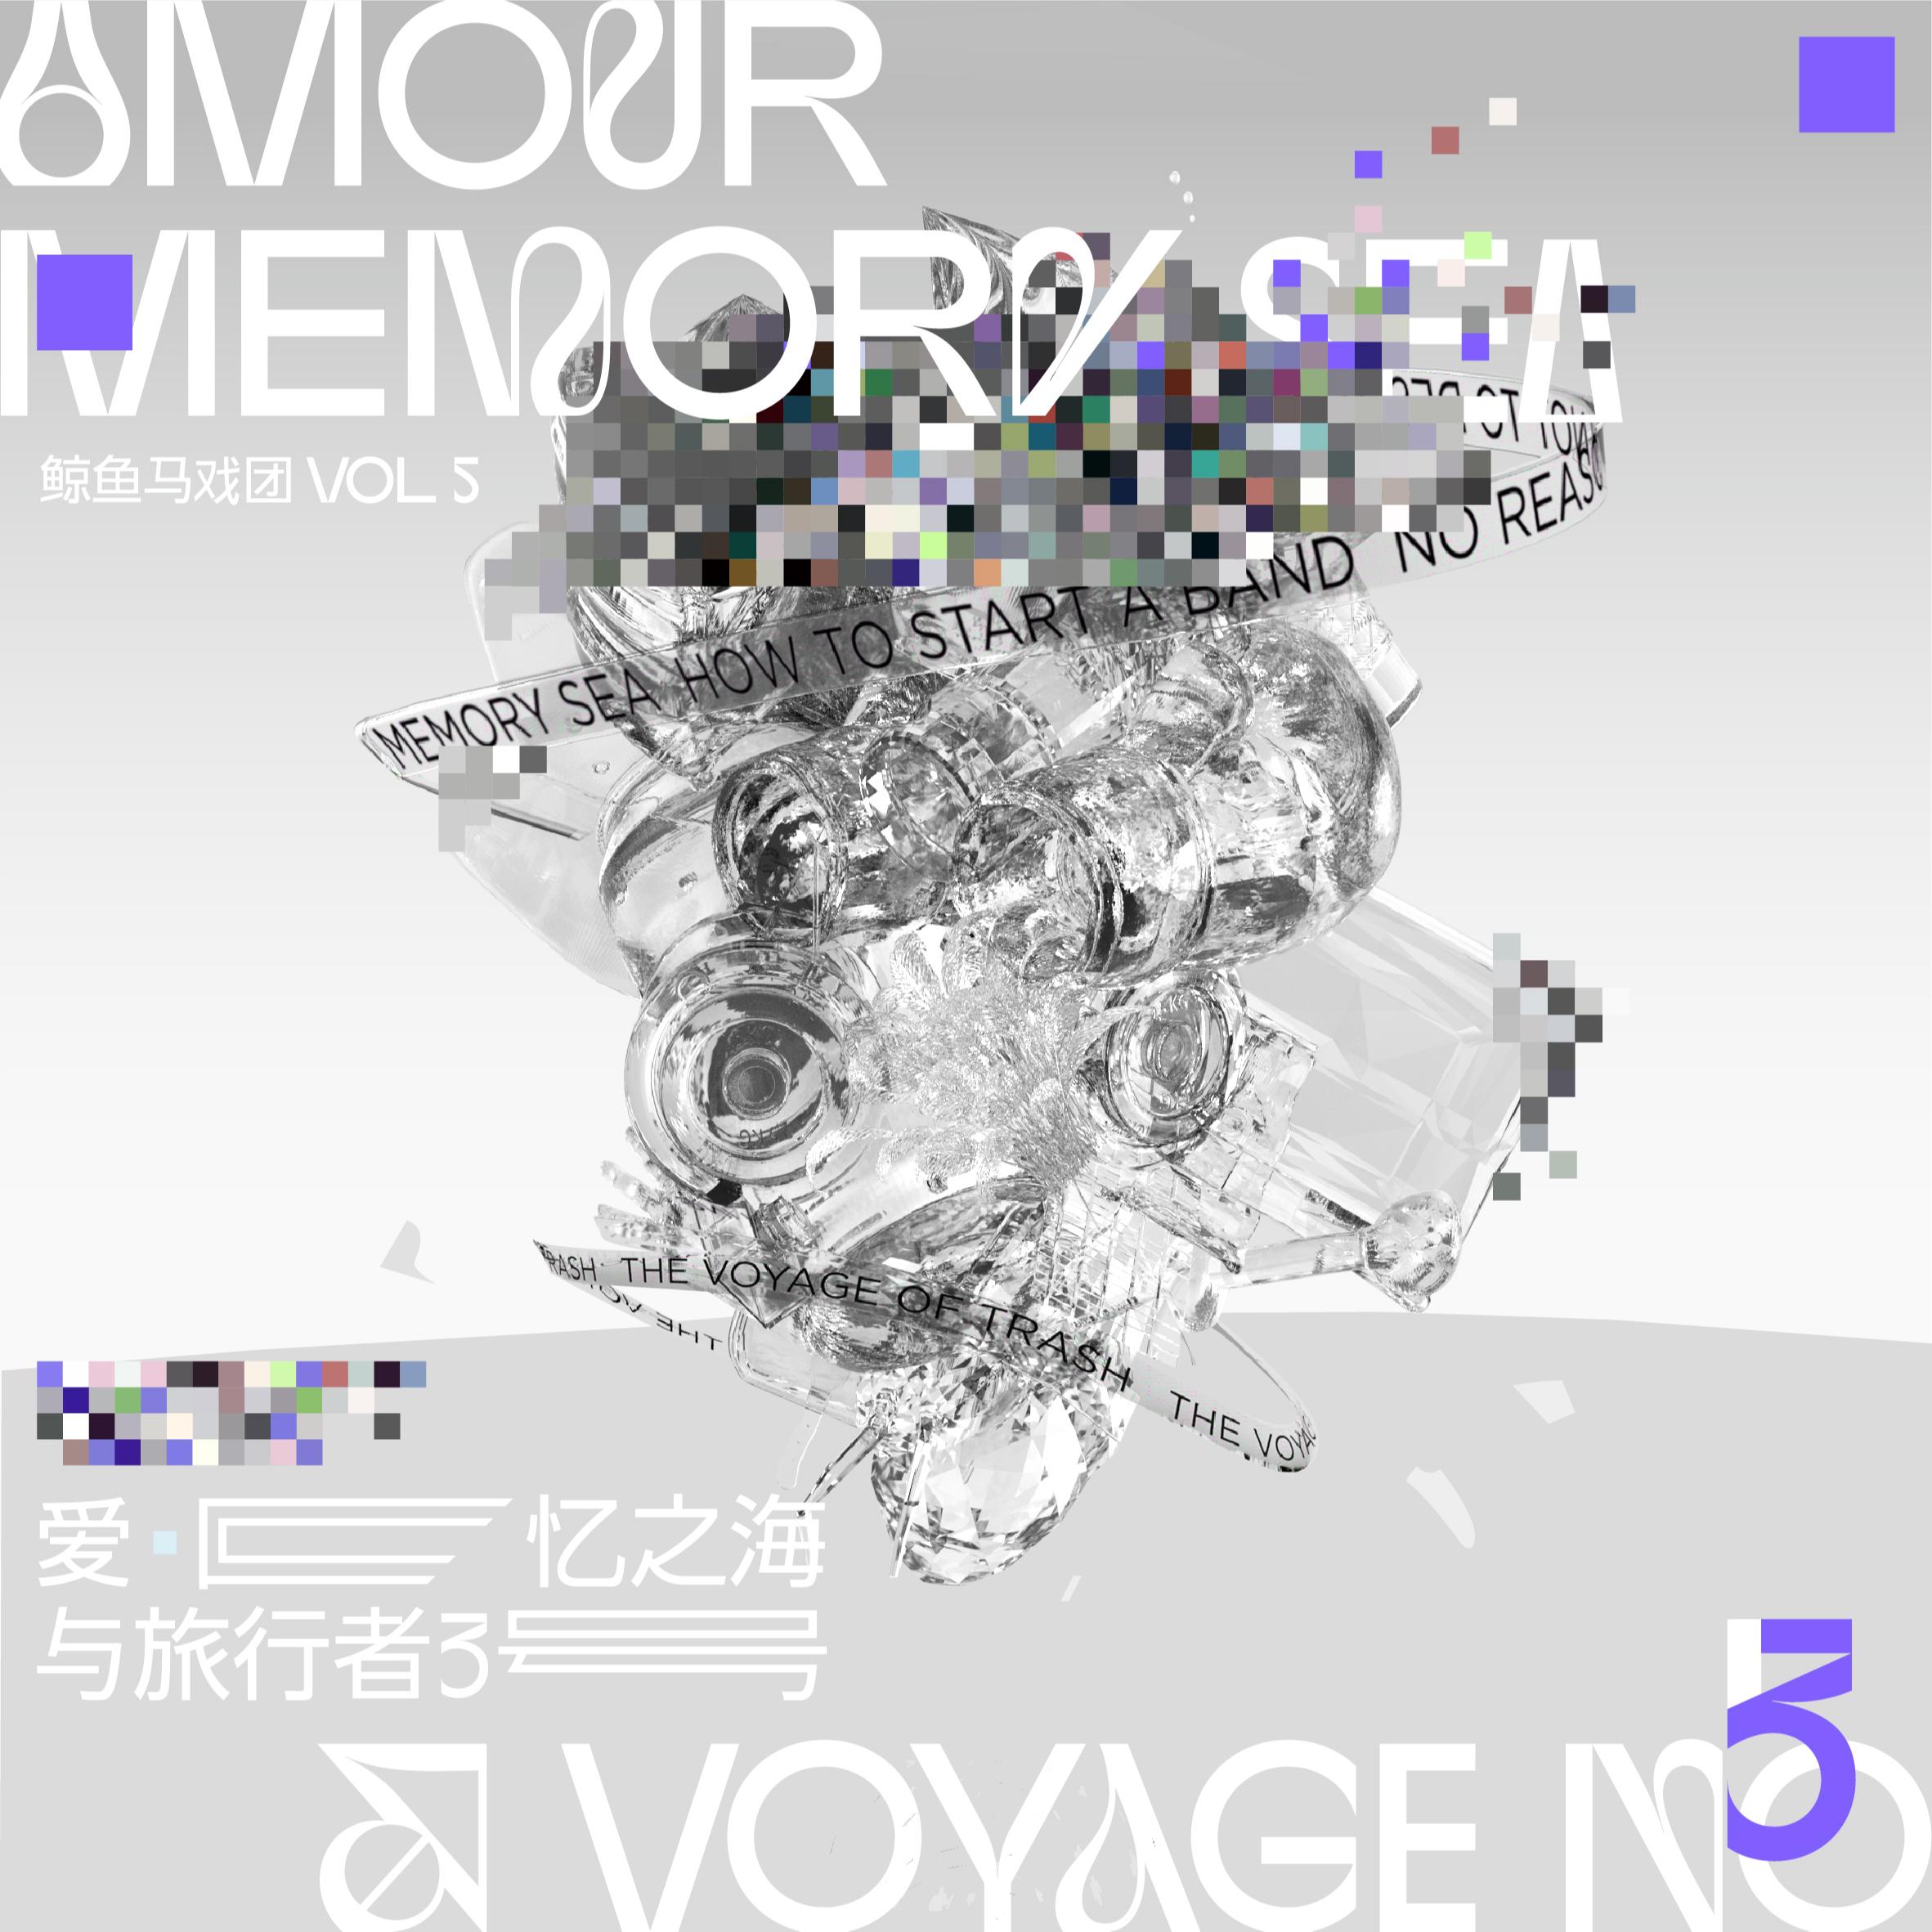 Vol.5爱,回忆之海与旅行者3号 LOVE,MEMORY SEA&VOYAGE 3